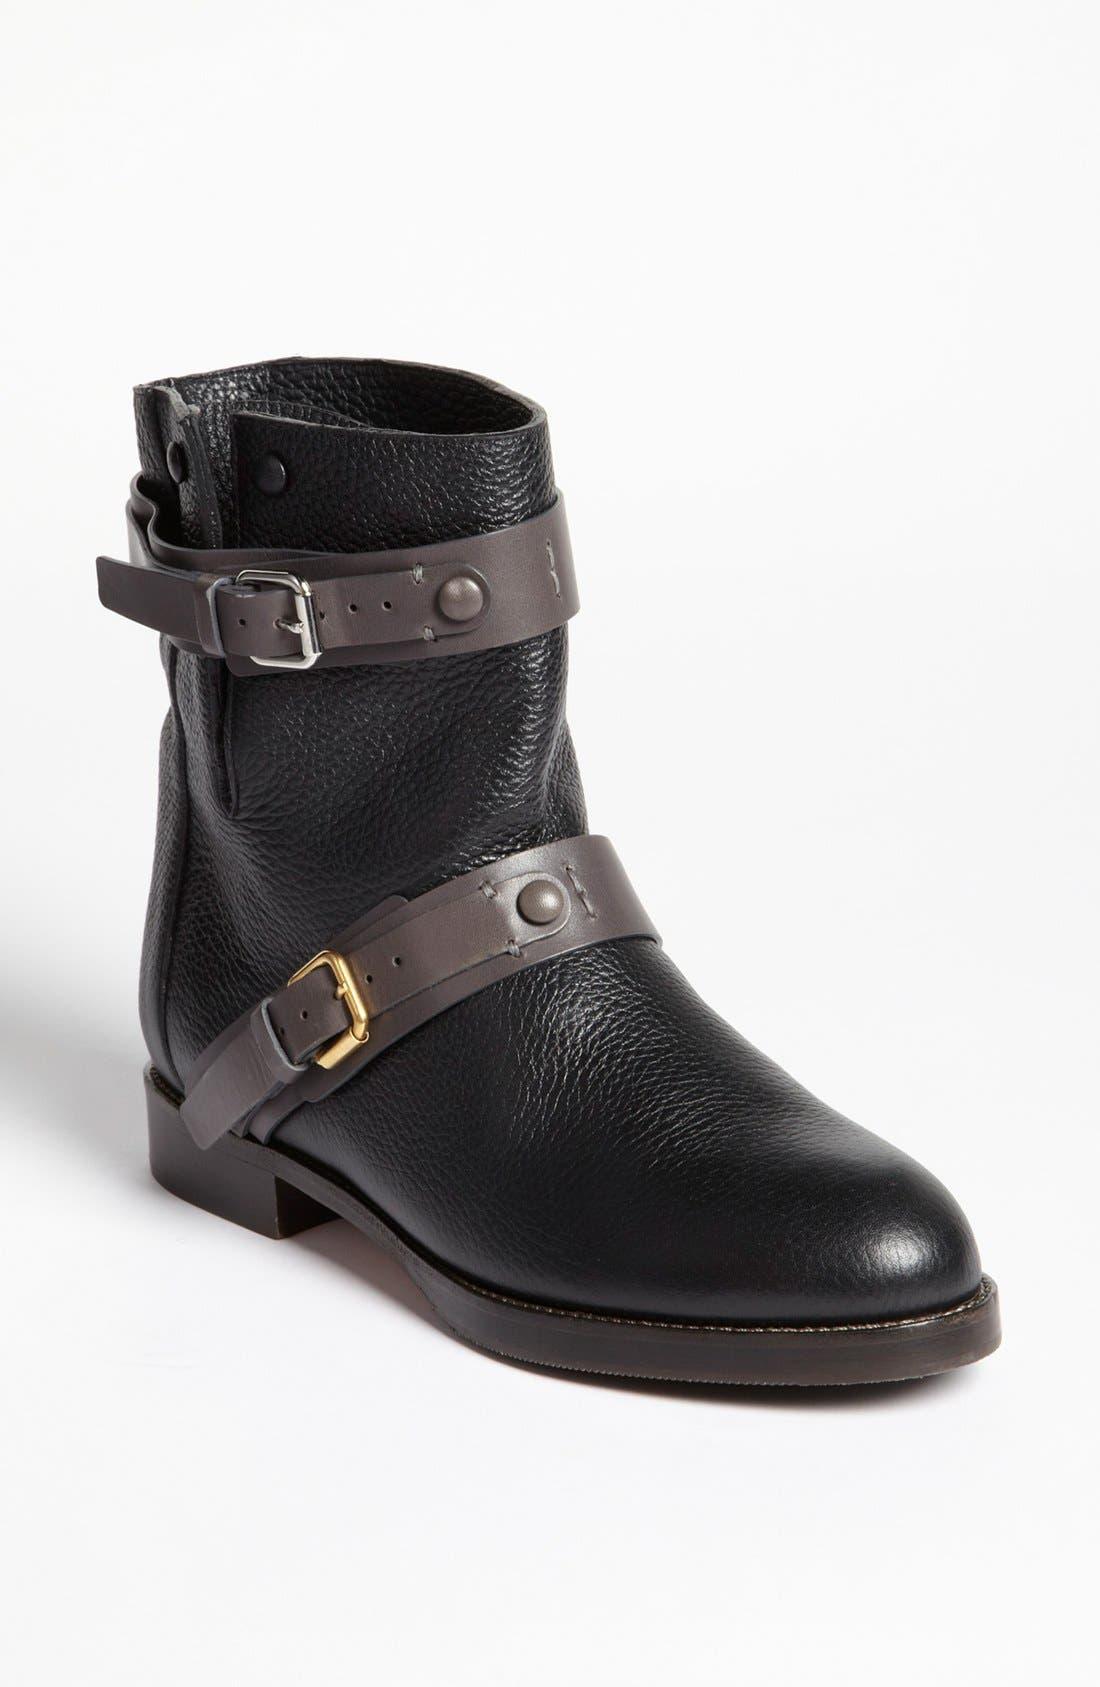 Alternate Image 1 Selected - Chloé 'Brune' Buckle Boot